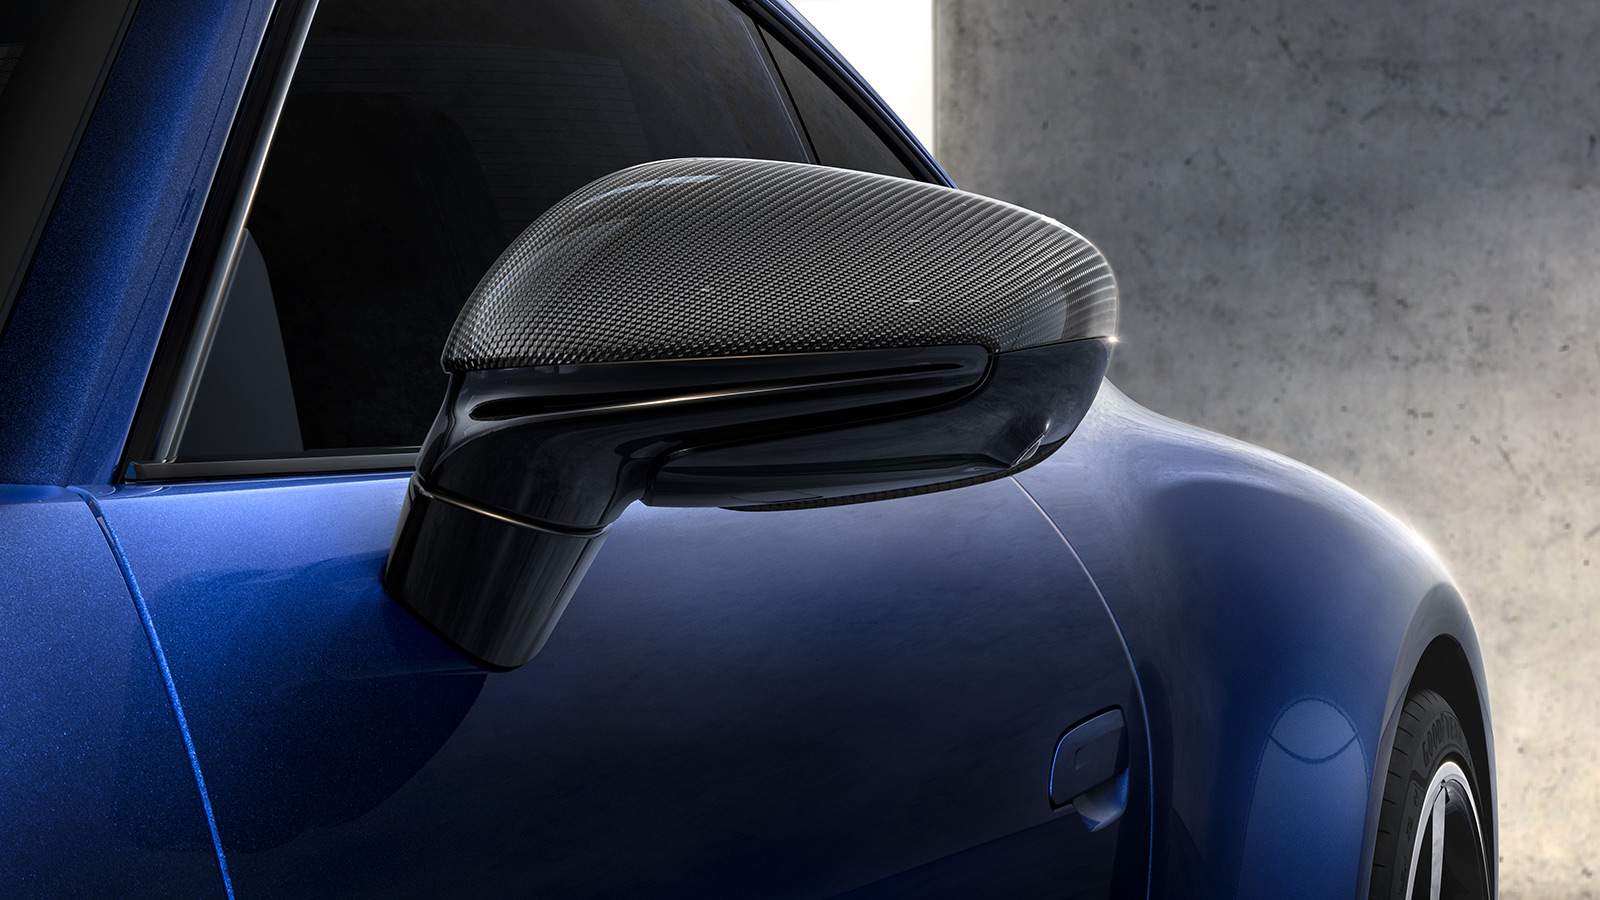 Porsche - Other Exterior & Performance options